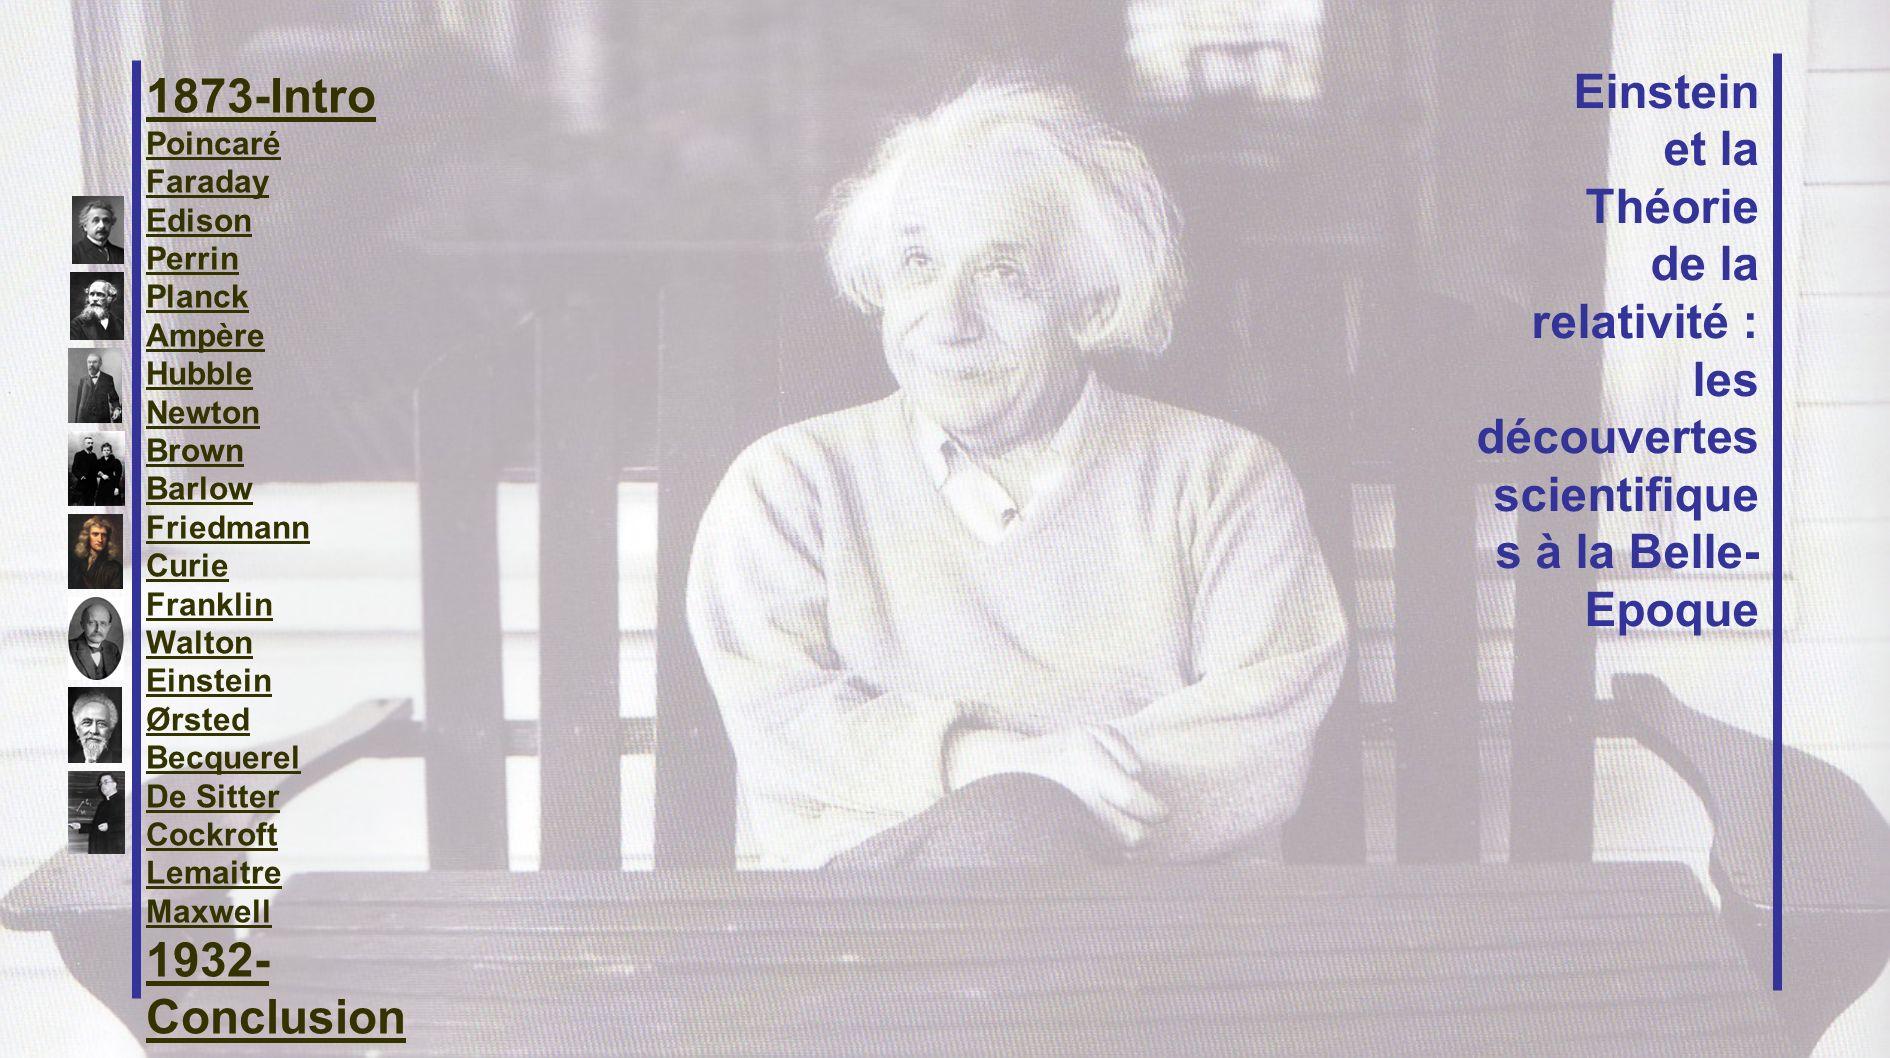 1873-Intro Poincaré Faraday Edison Perrin Planck Ampère Hubble Newton Brown Barlow Friedmann Curie Franklin Walton Einstein Ørsted Becquerel De Sitter